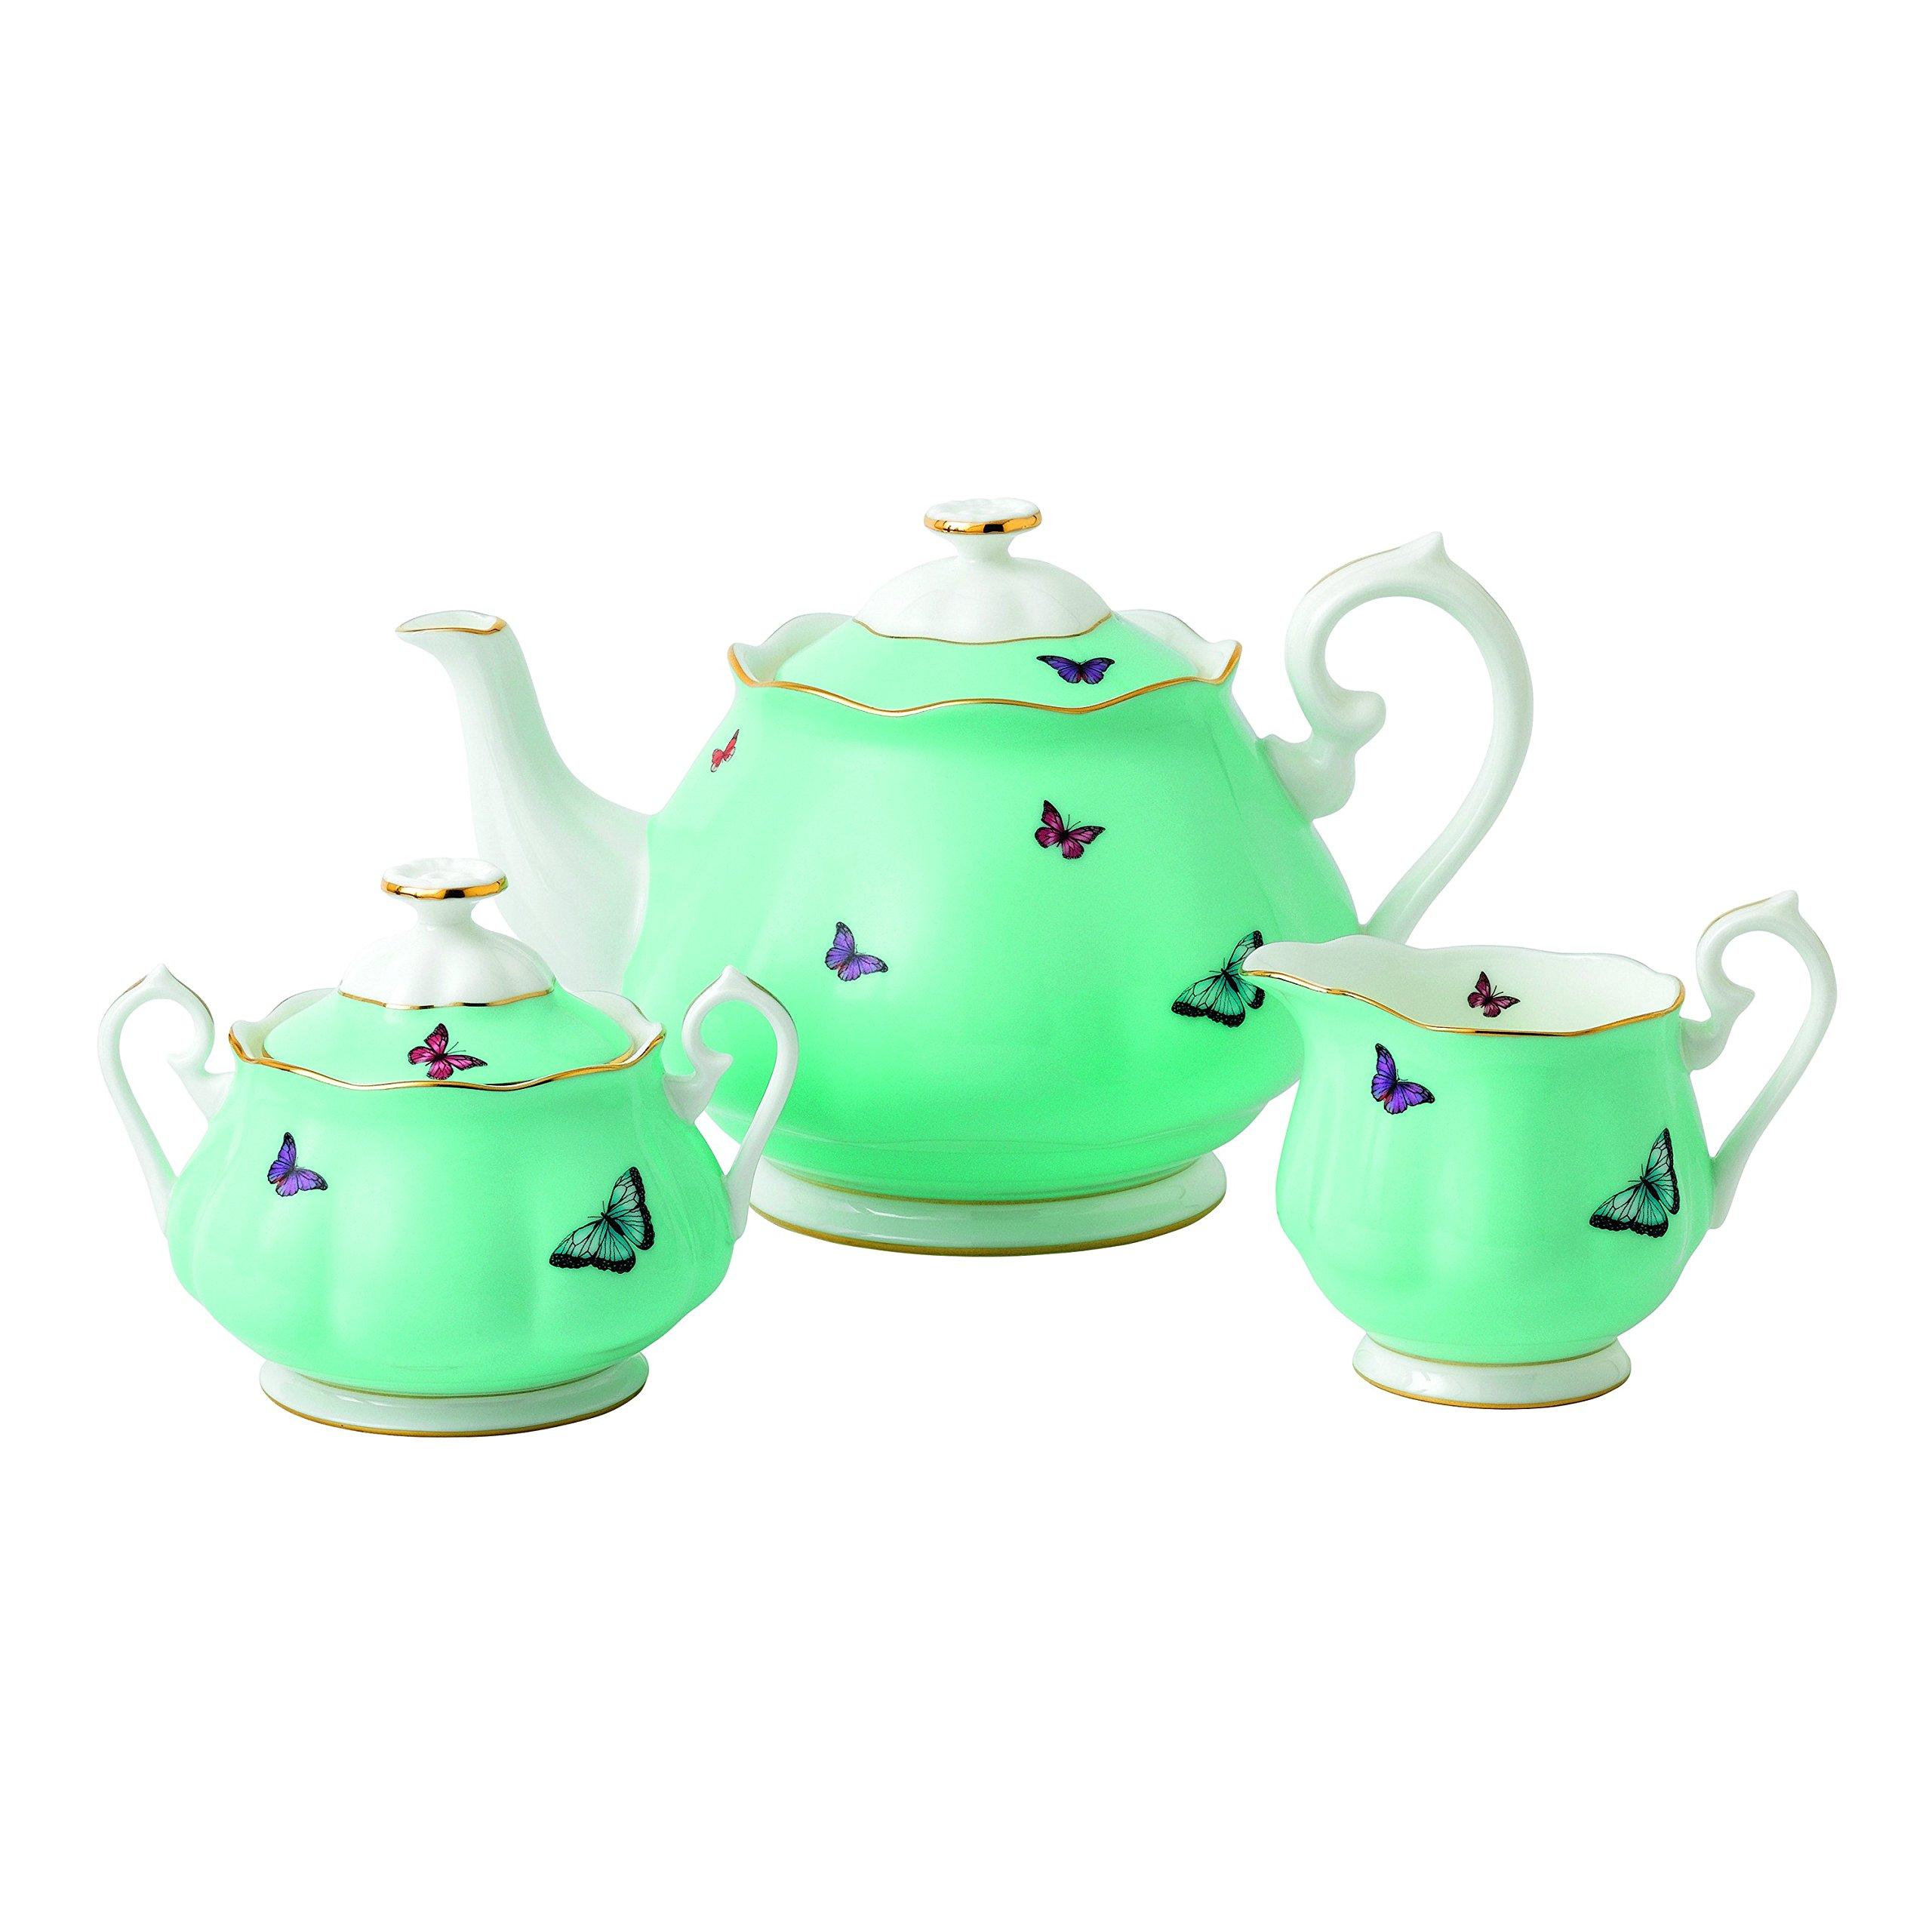 Royal Albert 40025886 Miranda Kerr Blessings 3-Piece Set (Teapot, Sugar & Creamer), Multicolor